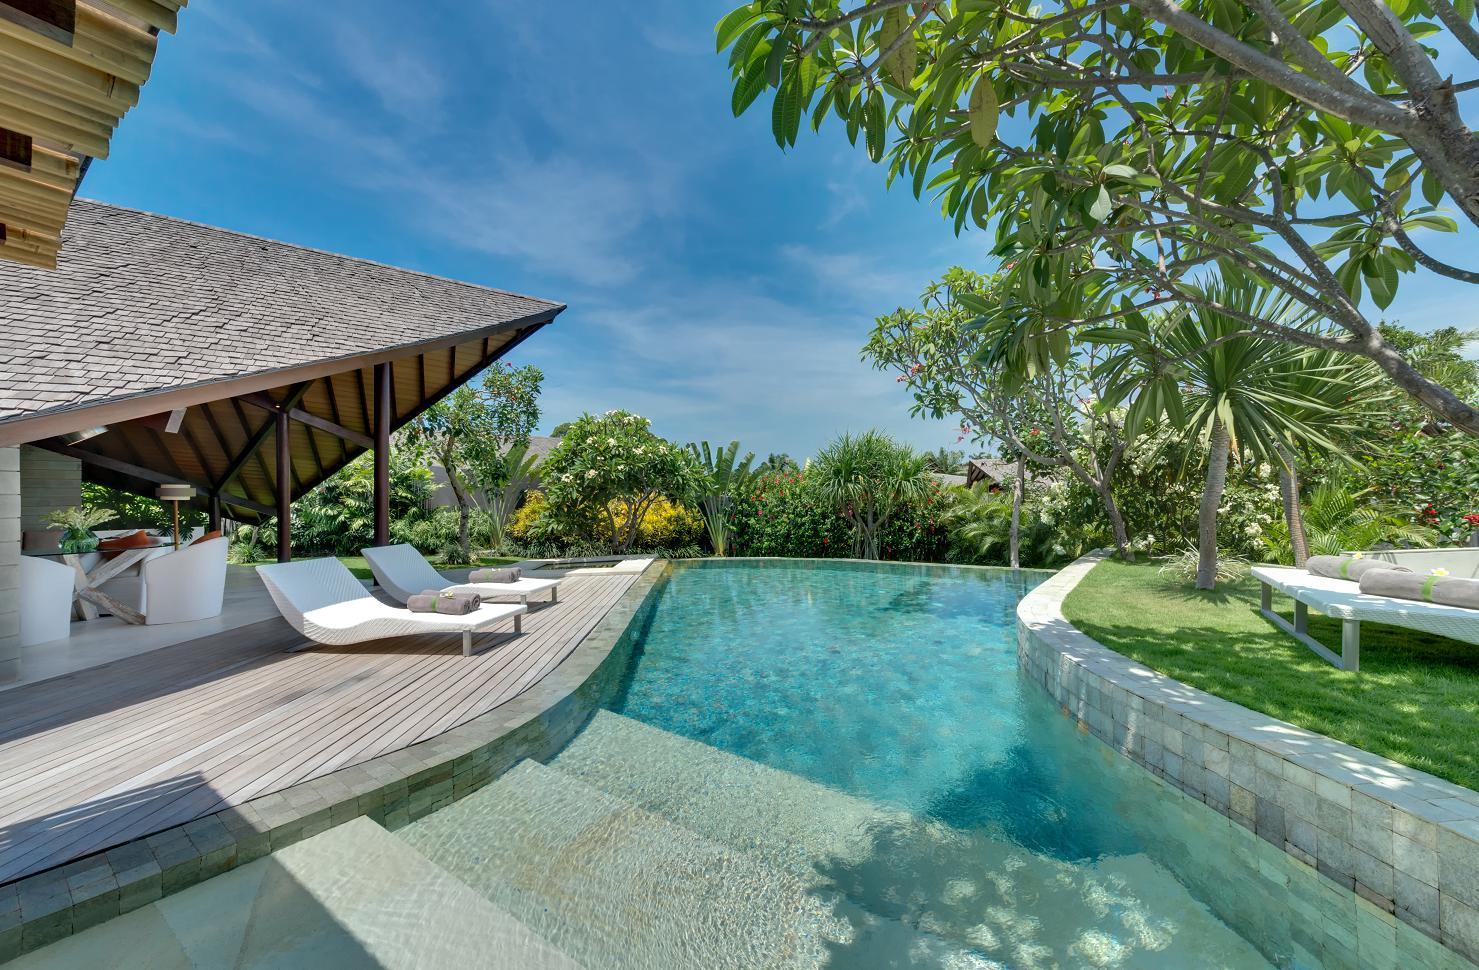 The Layar - 2 Bedroom Villa - Pool - Seminyak, Bali